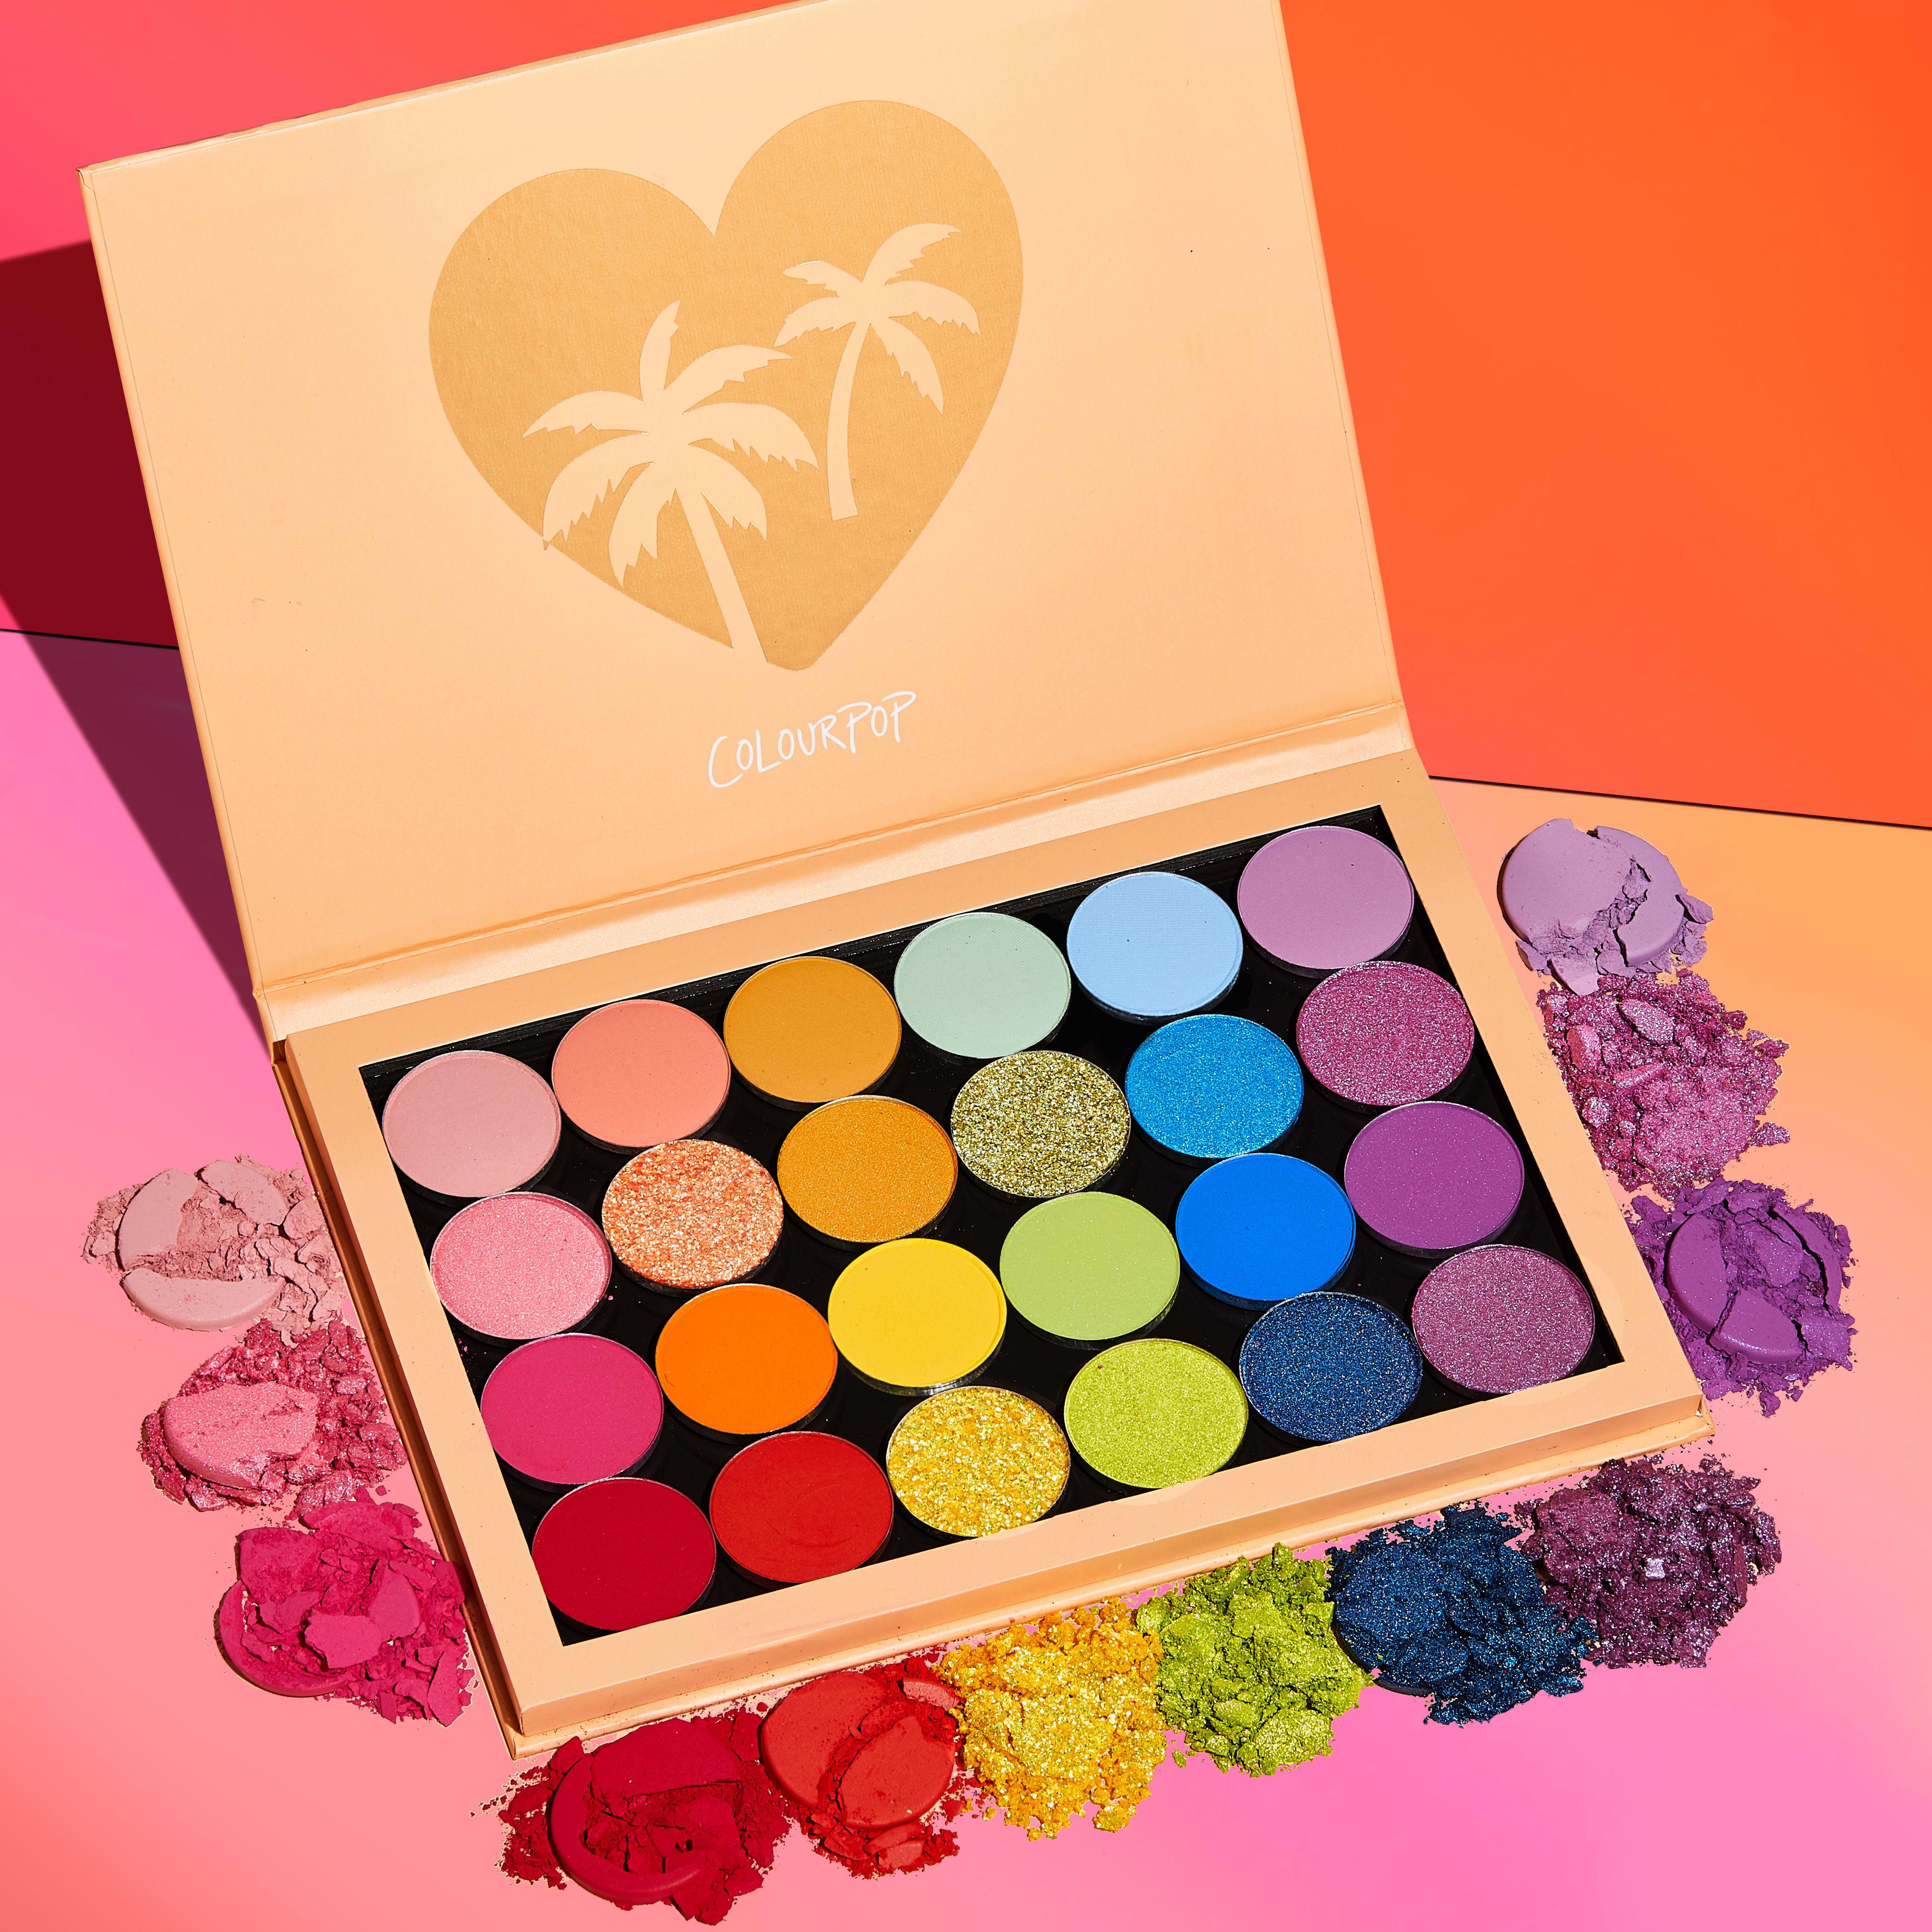 shop she's a rainbow palette